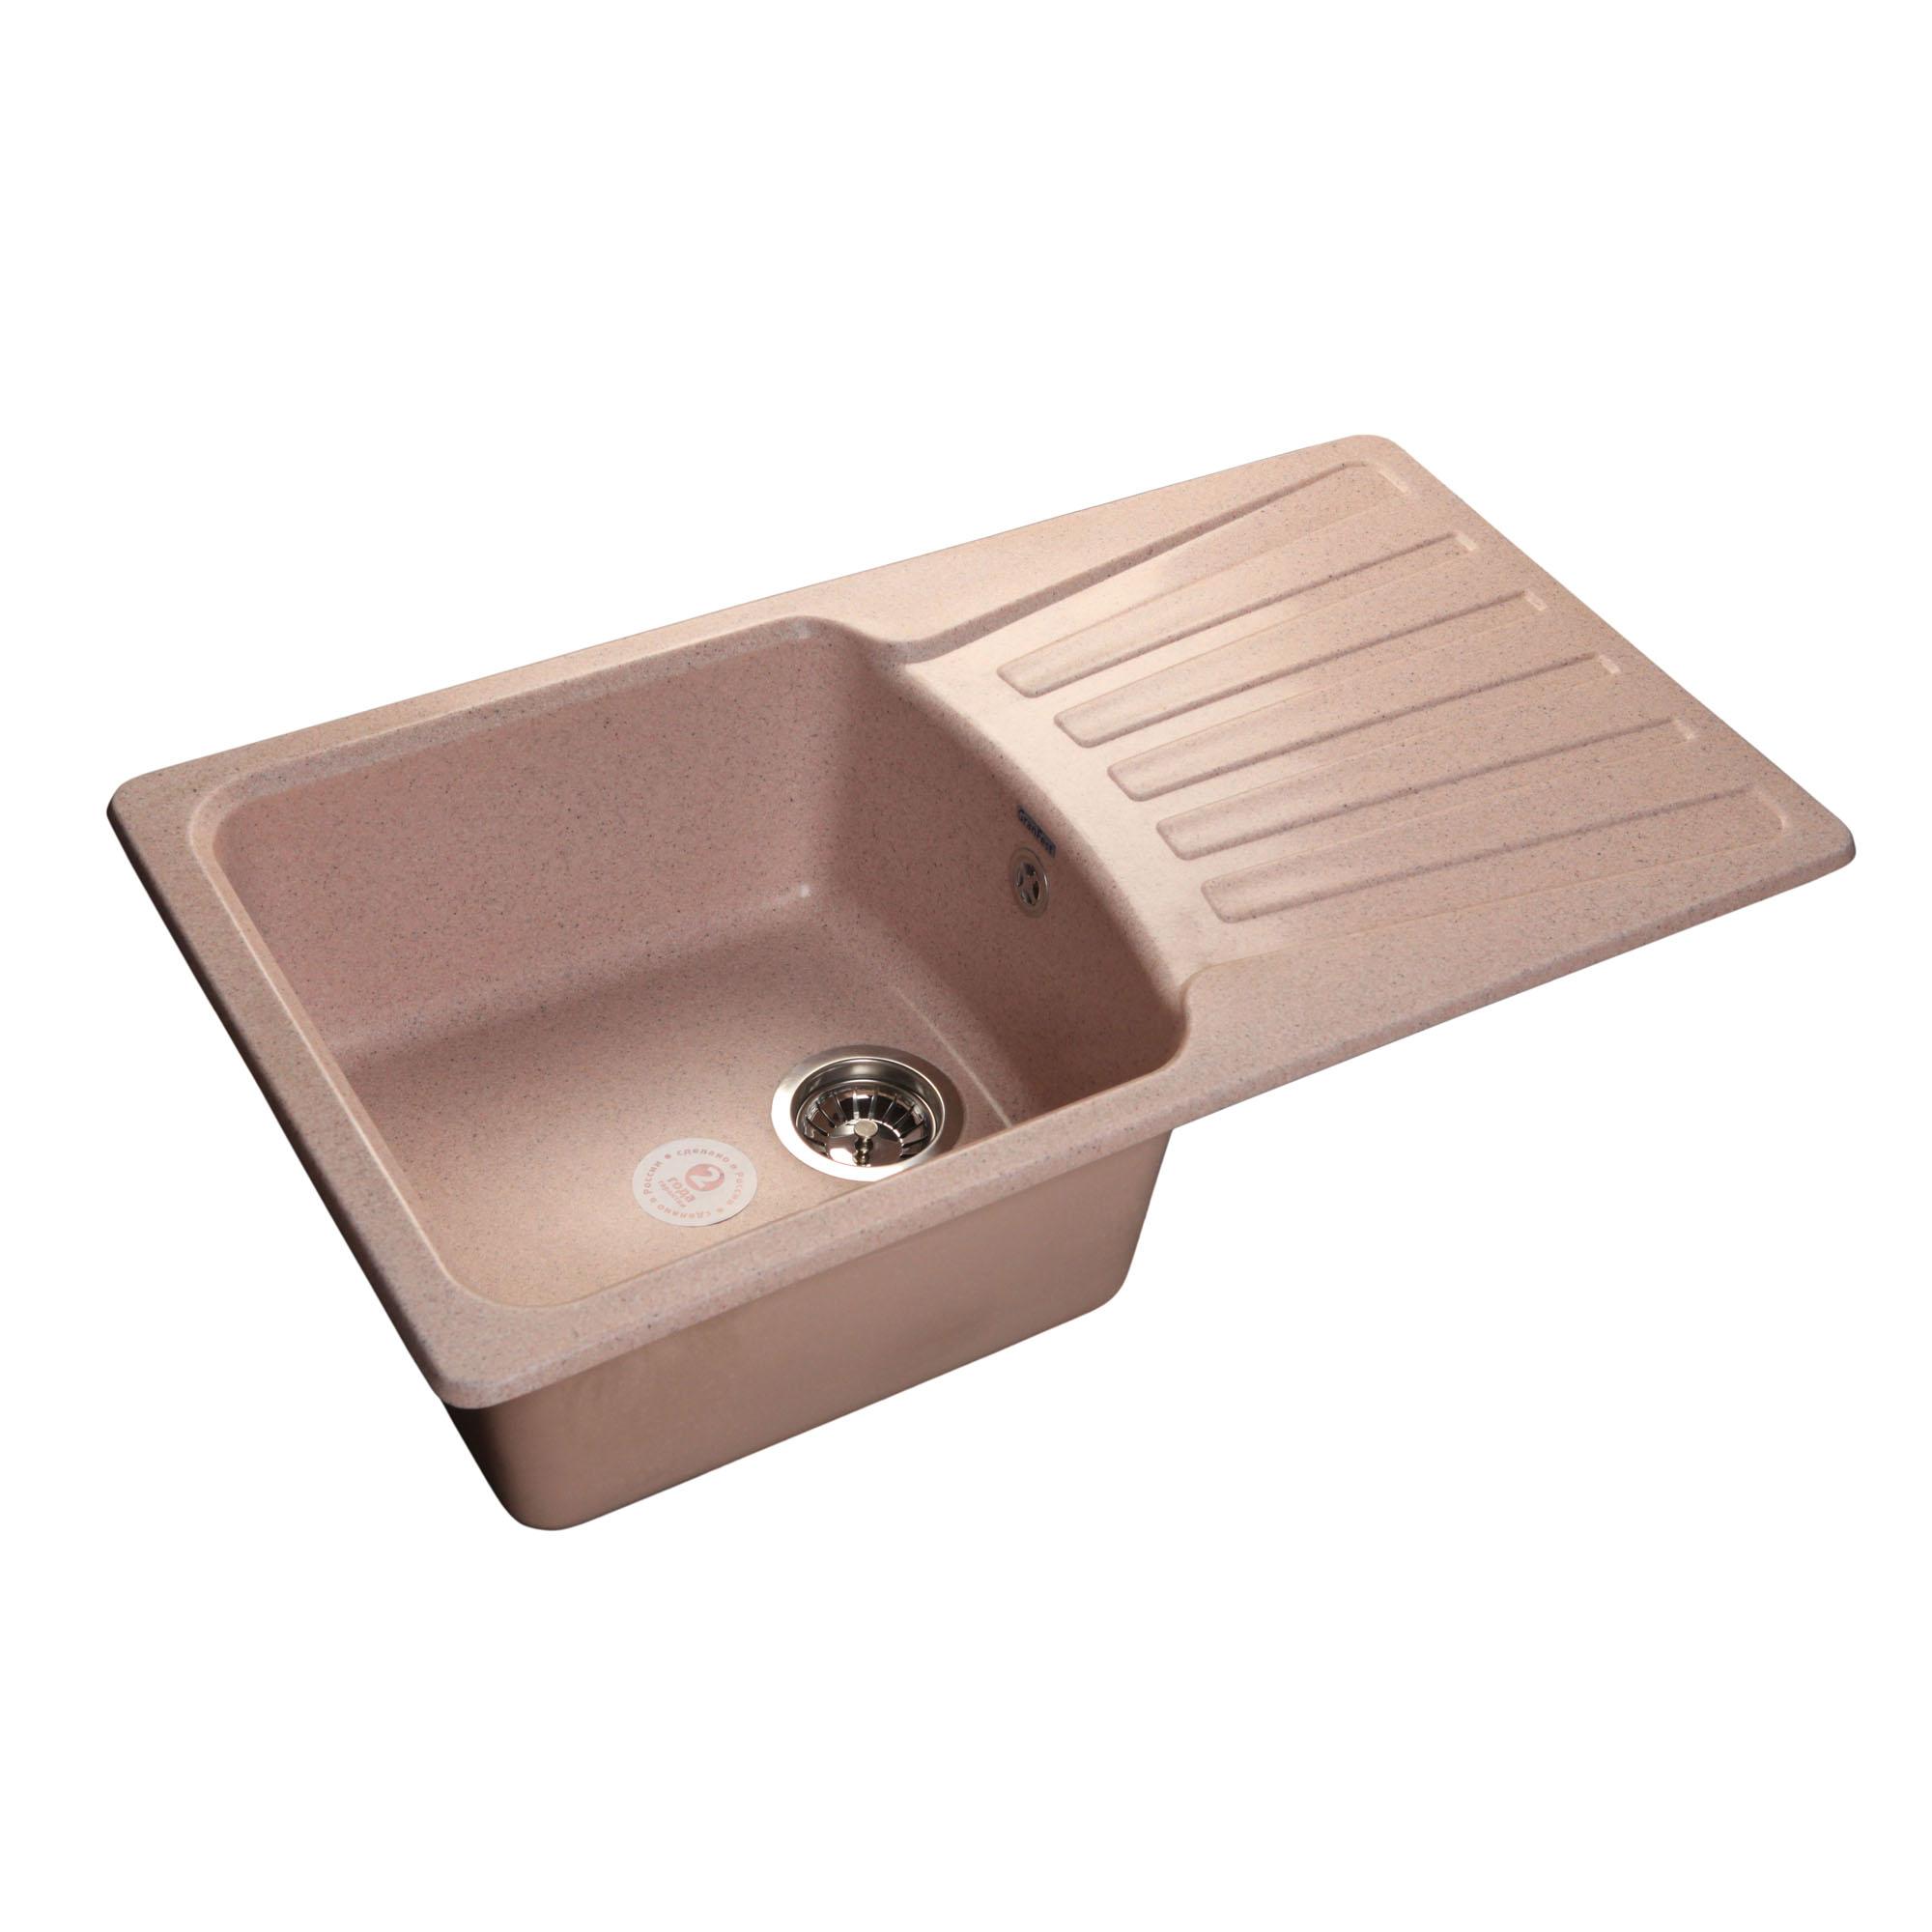 Кухонная мойка GranFest Standart GF-S850L розовый мойка кухонная granfest гранит 850x495 gf s850l терракот